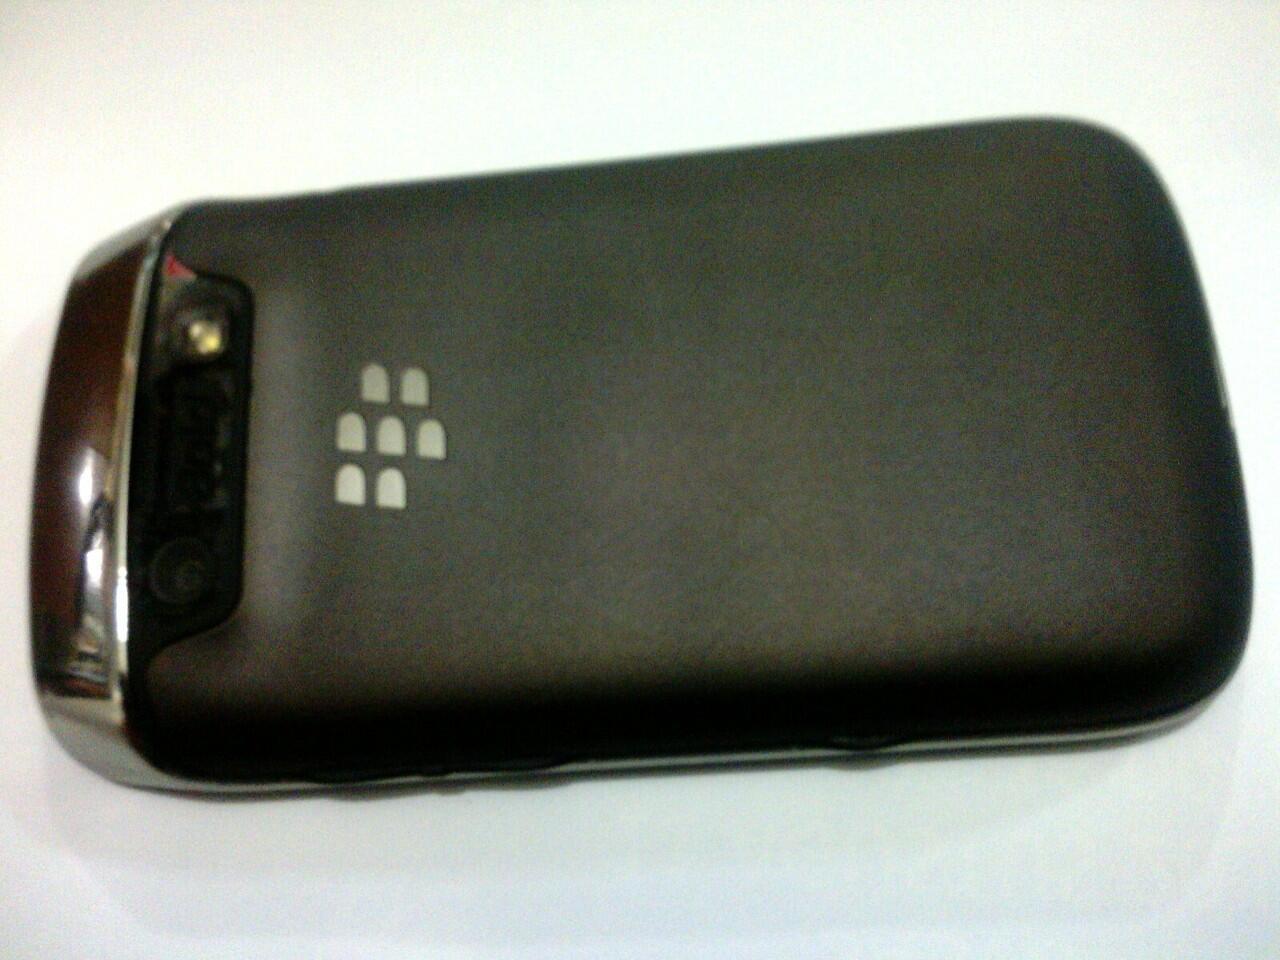 JUAL Blackberry 9790 Bellagio/ Onyx 3